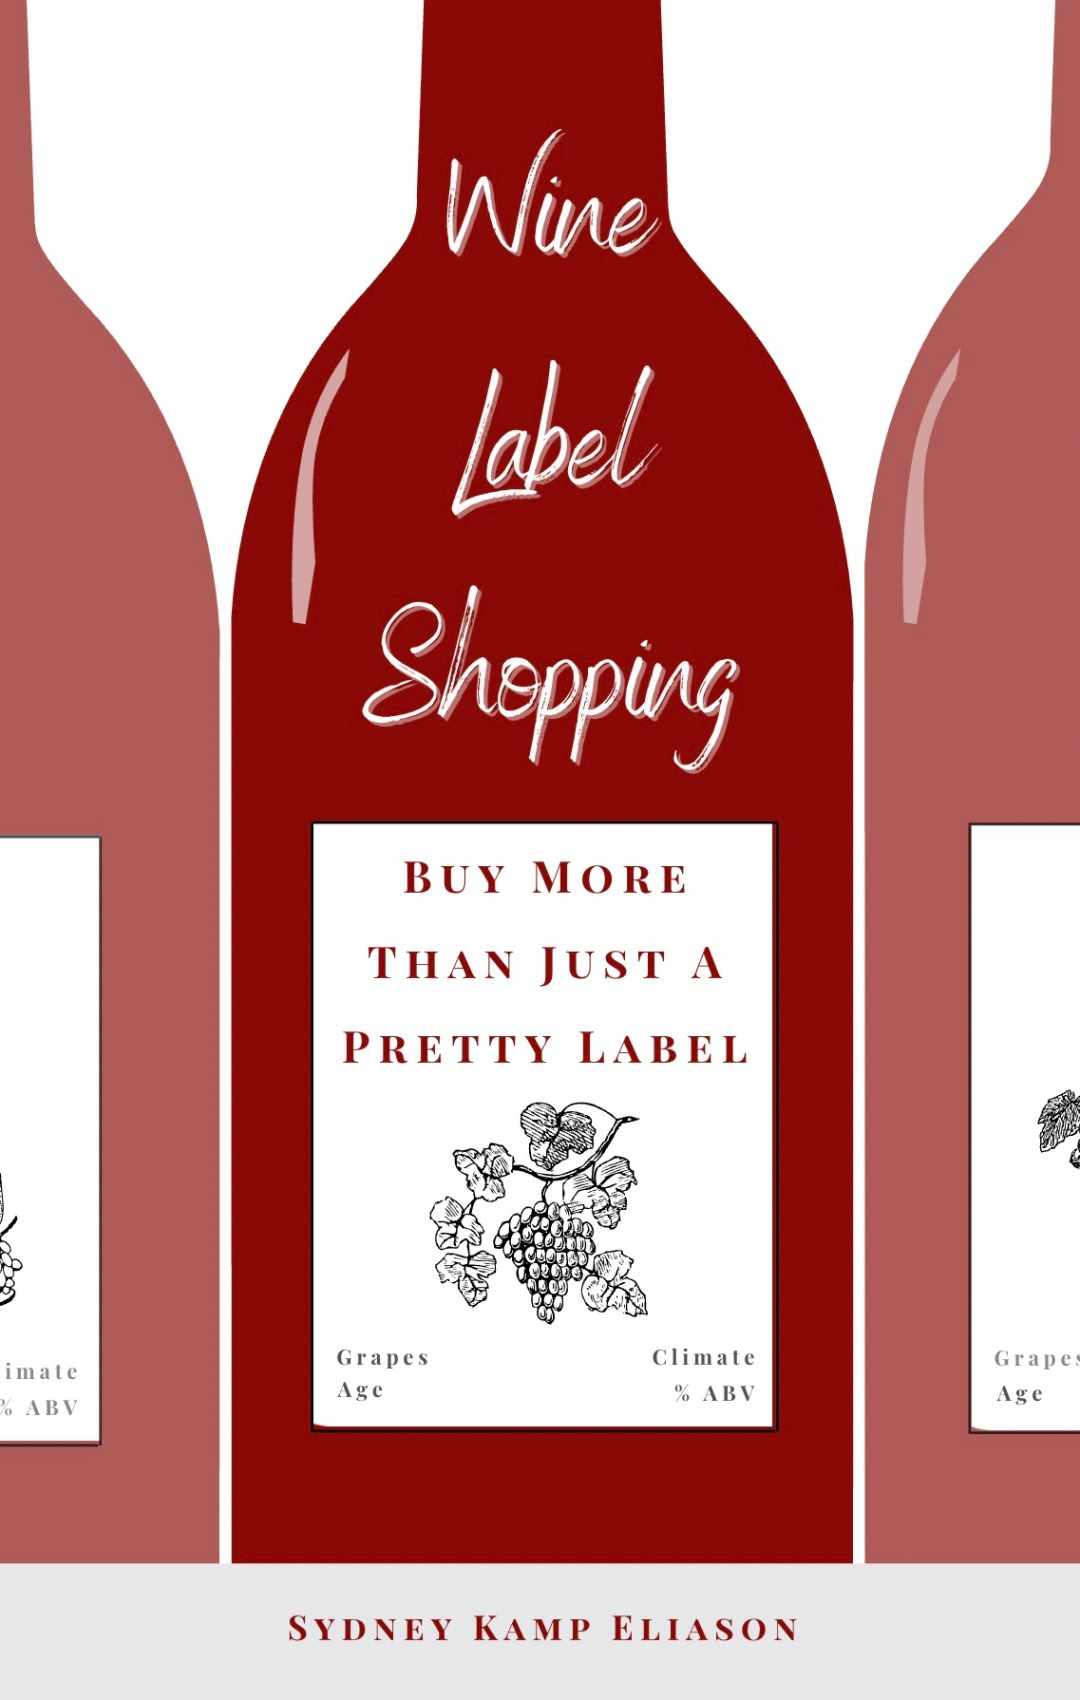 Wine Label Shopping